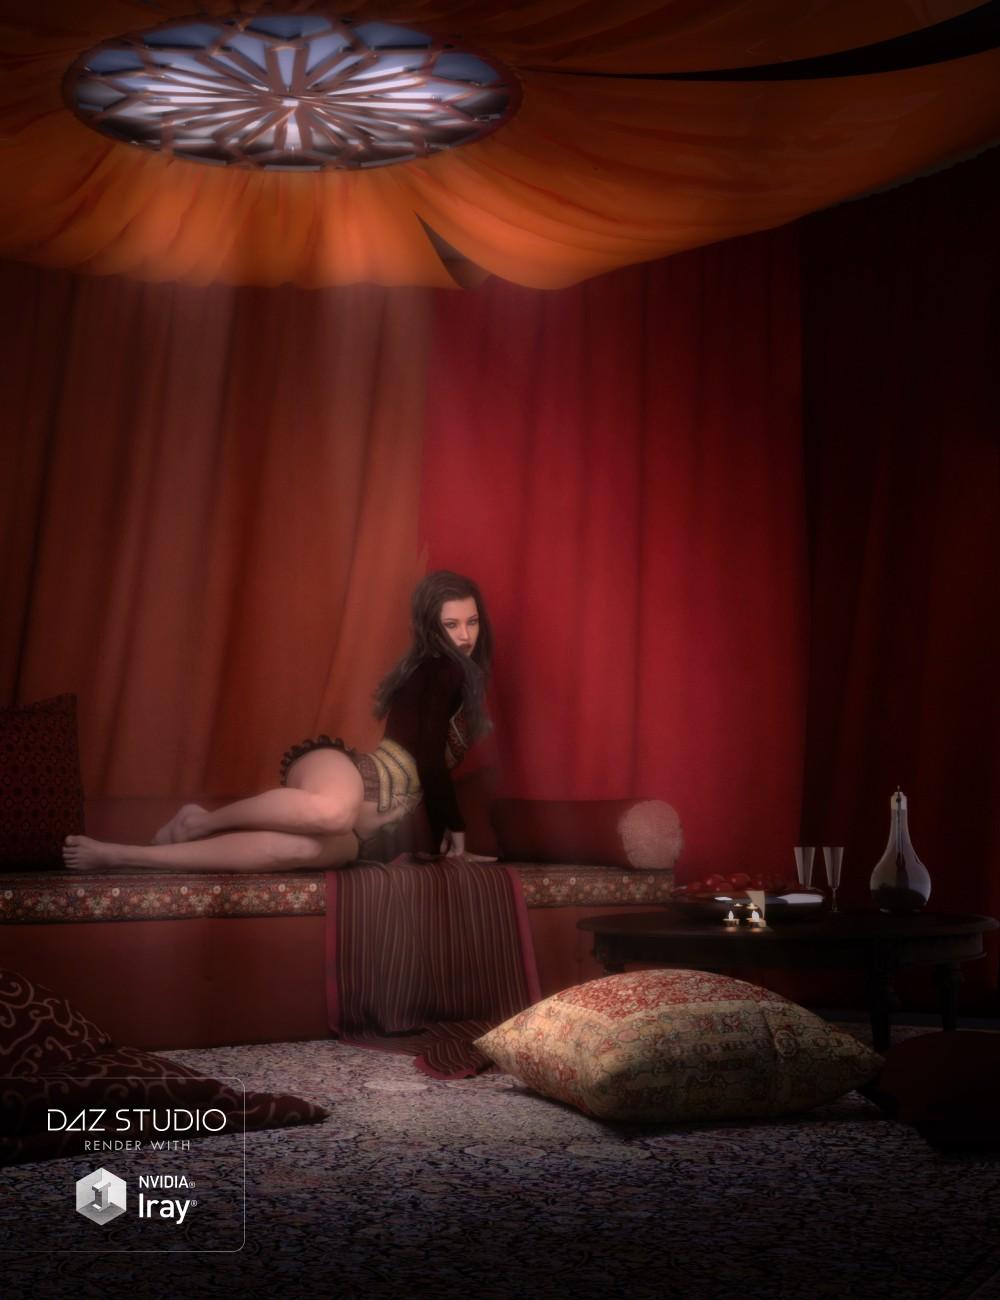 Download daz studio 3 for free daz 3d eastern tent room for Living room 2 for daz studio